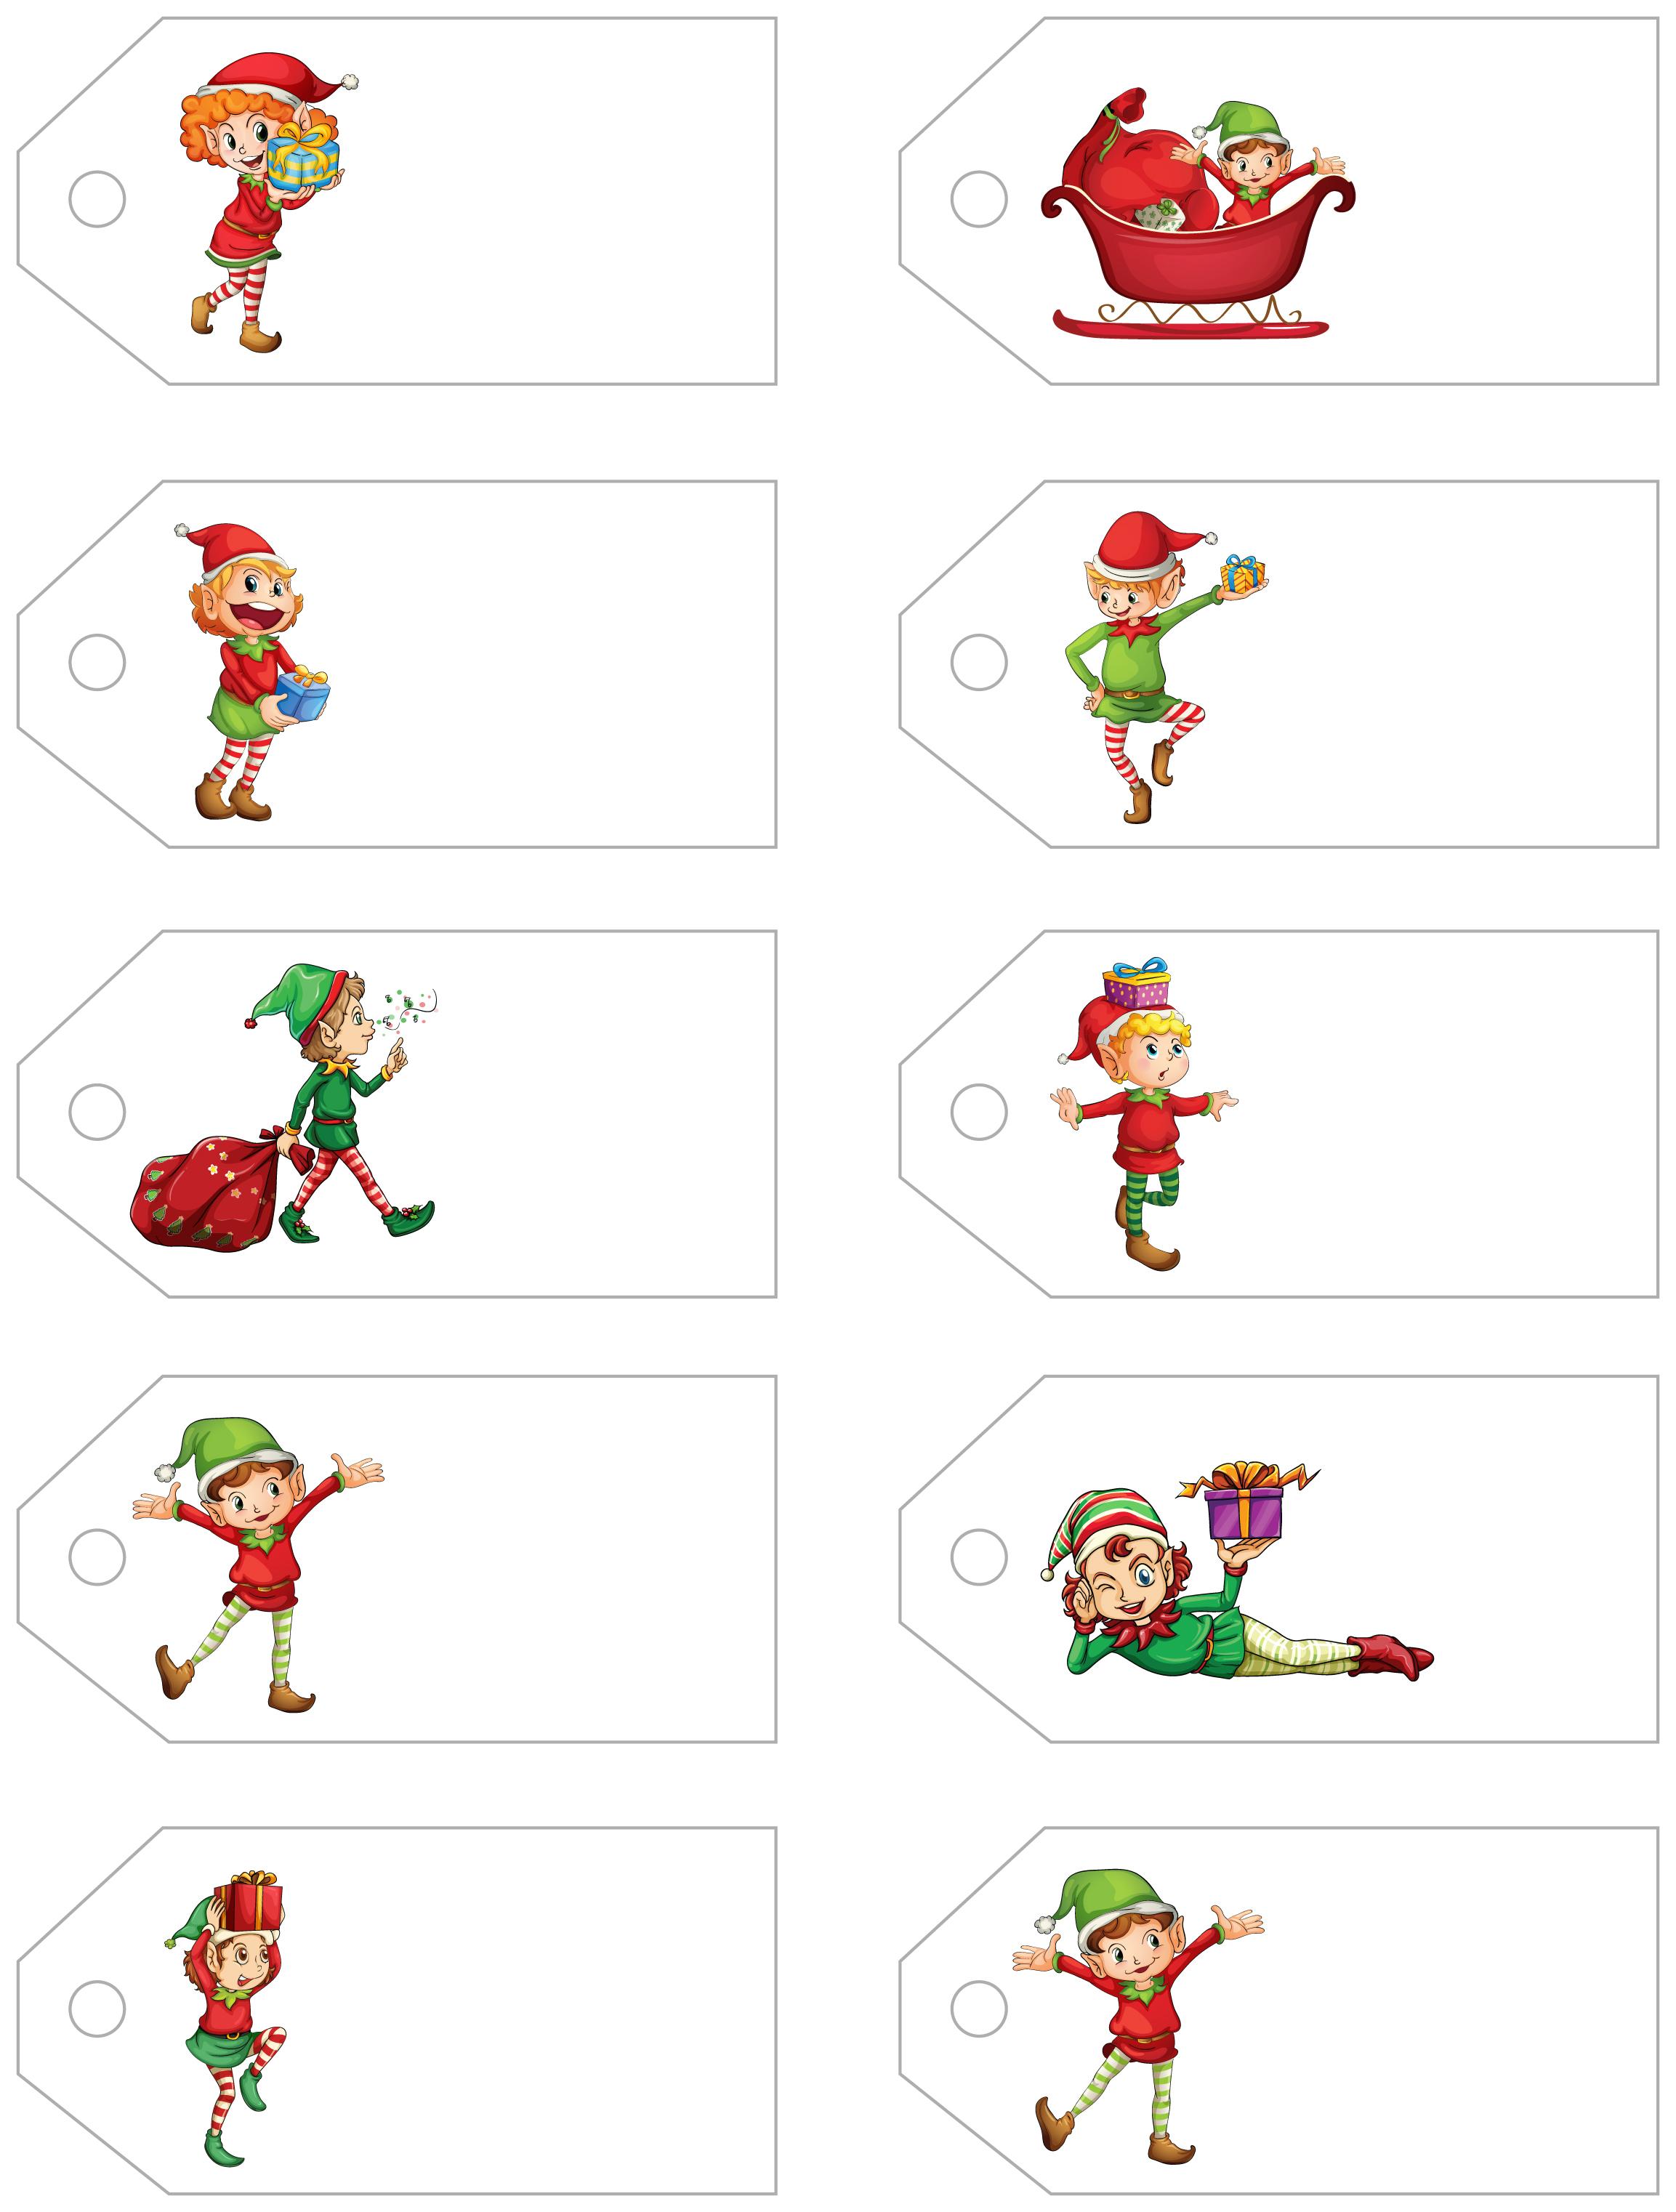 Santa's Little Gift To You! Free Printable Gift Tags And Labels - Free Printable Gift Tags